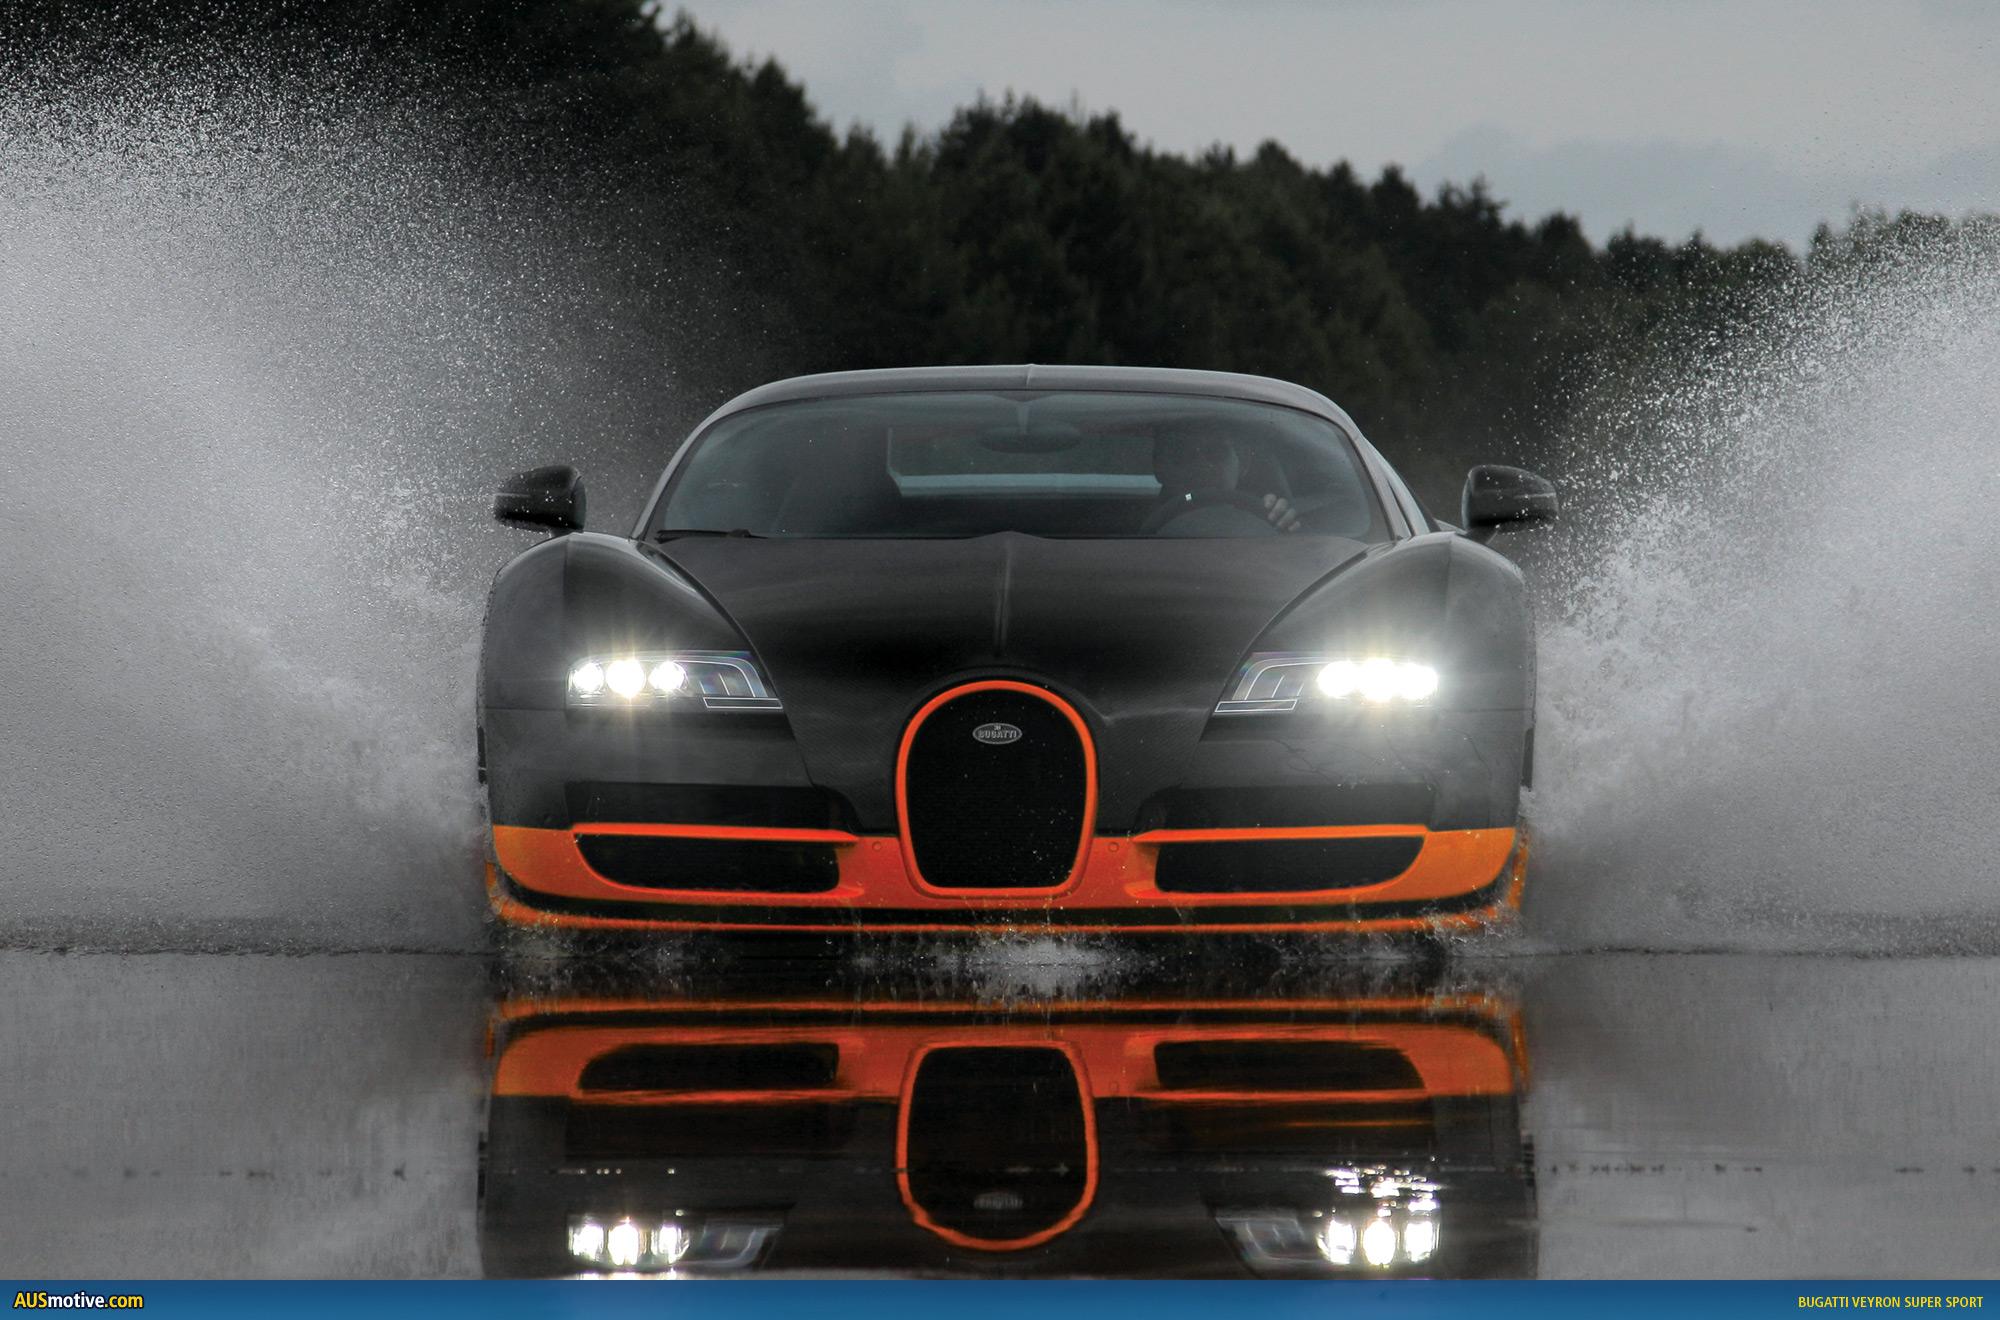 Bugatti-Veyron-Super-Sport-04 Inspiring Bugatti Veyron Price Australian Dollars Cars Trend